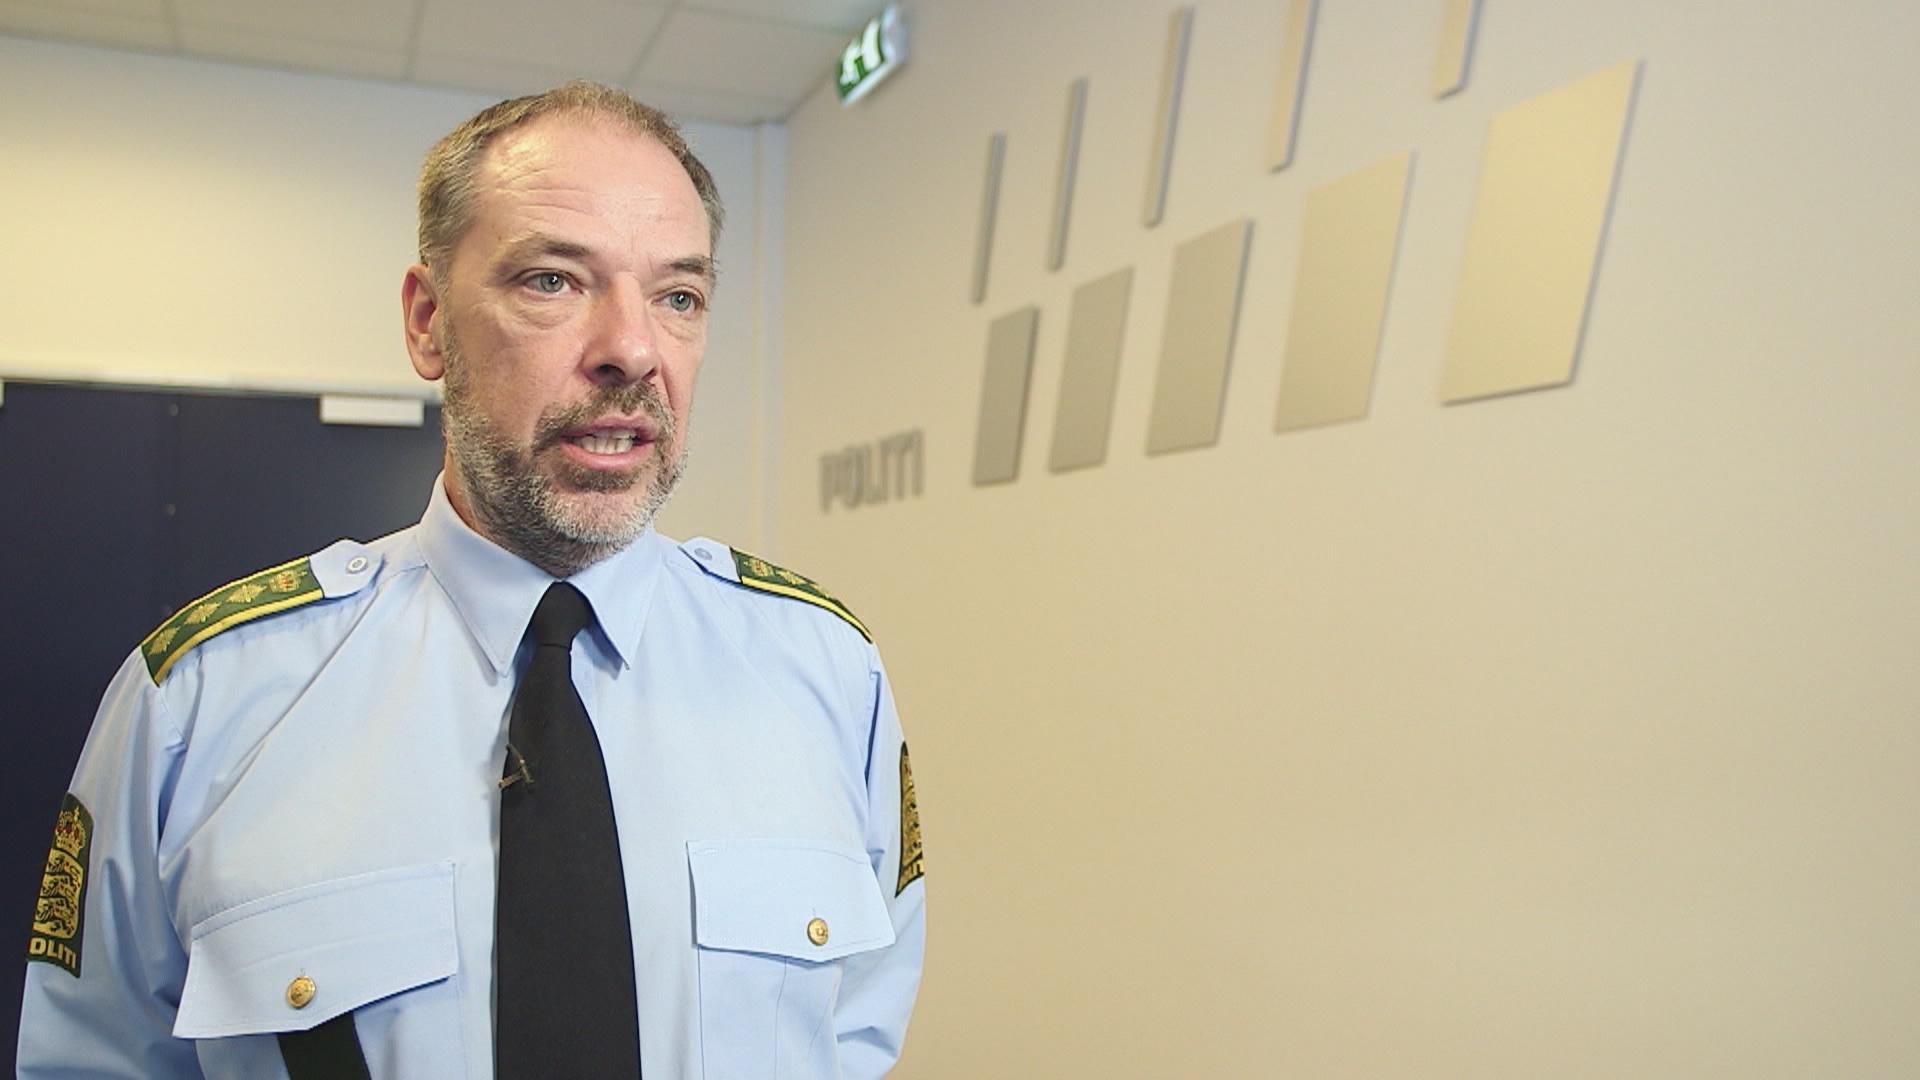 Michael Kjeldgaard, chef for Nationalt Efterforskningscenter, NEC, under Rigspolitiet.jpeg